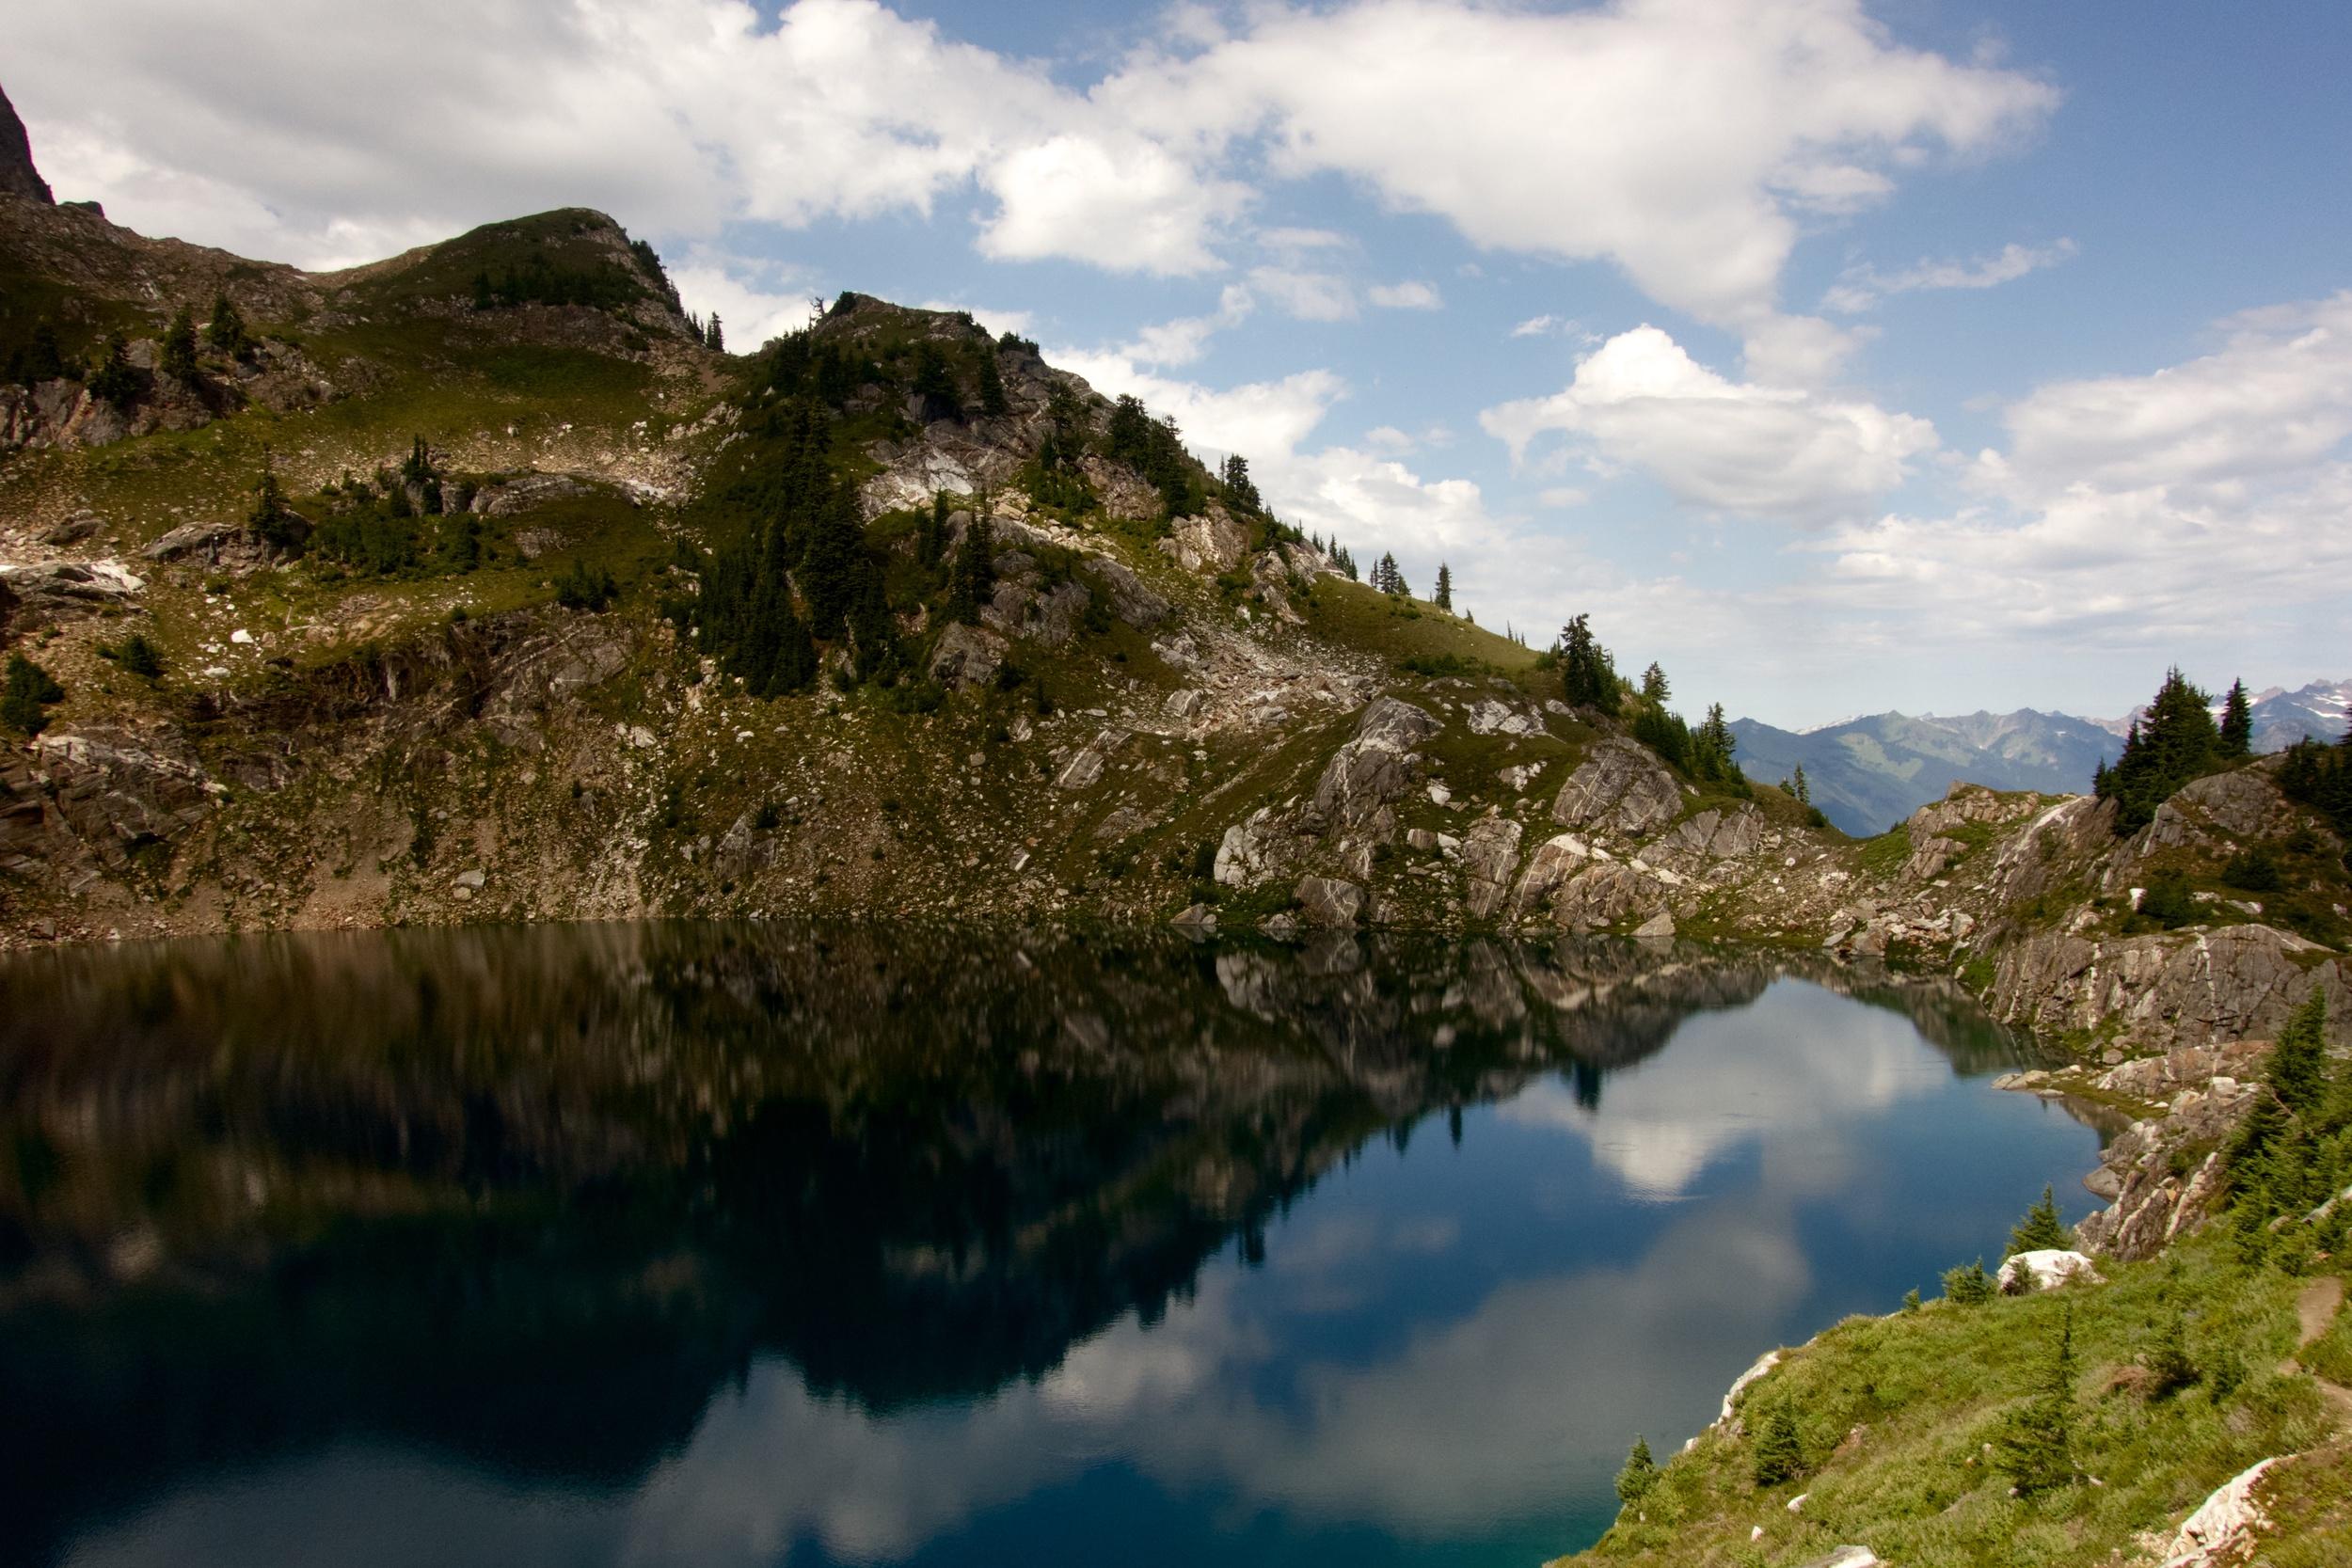 Lake Below Glacier Peak